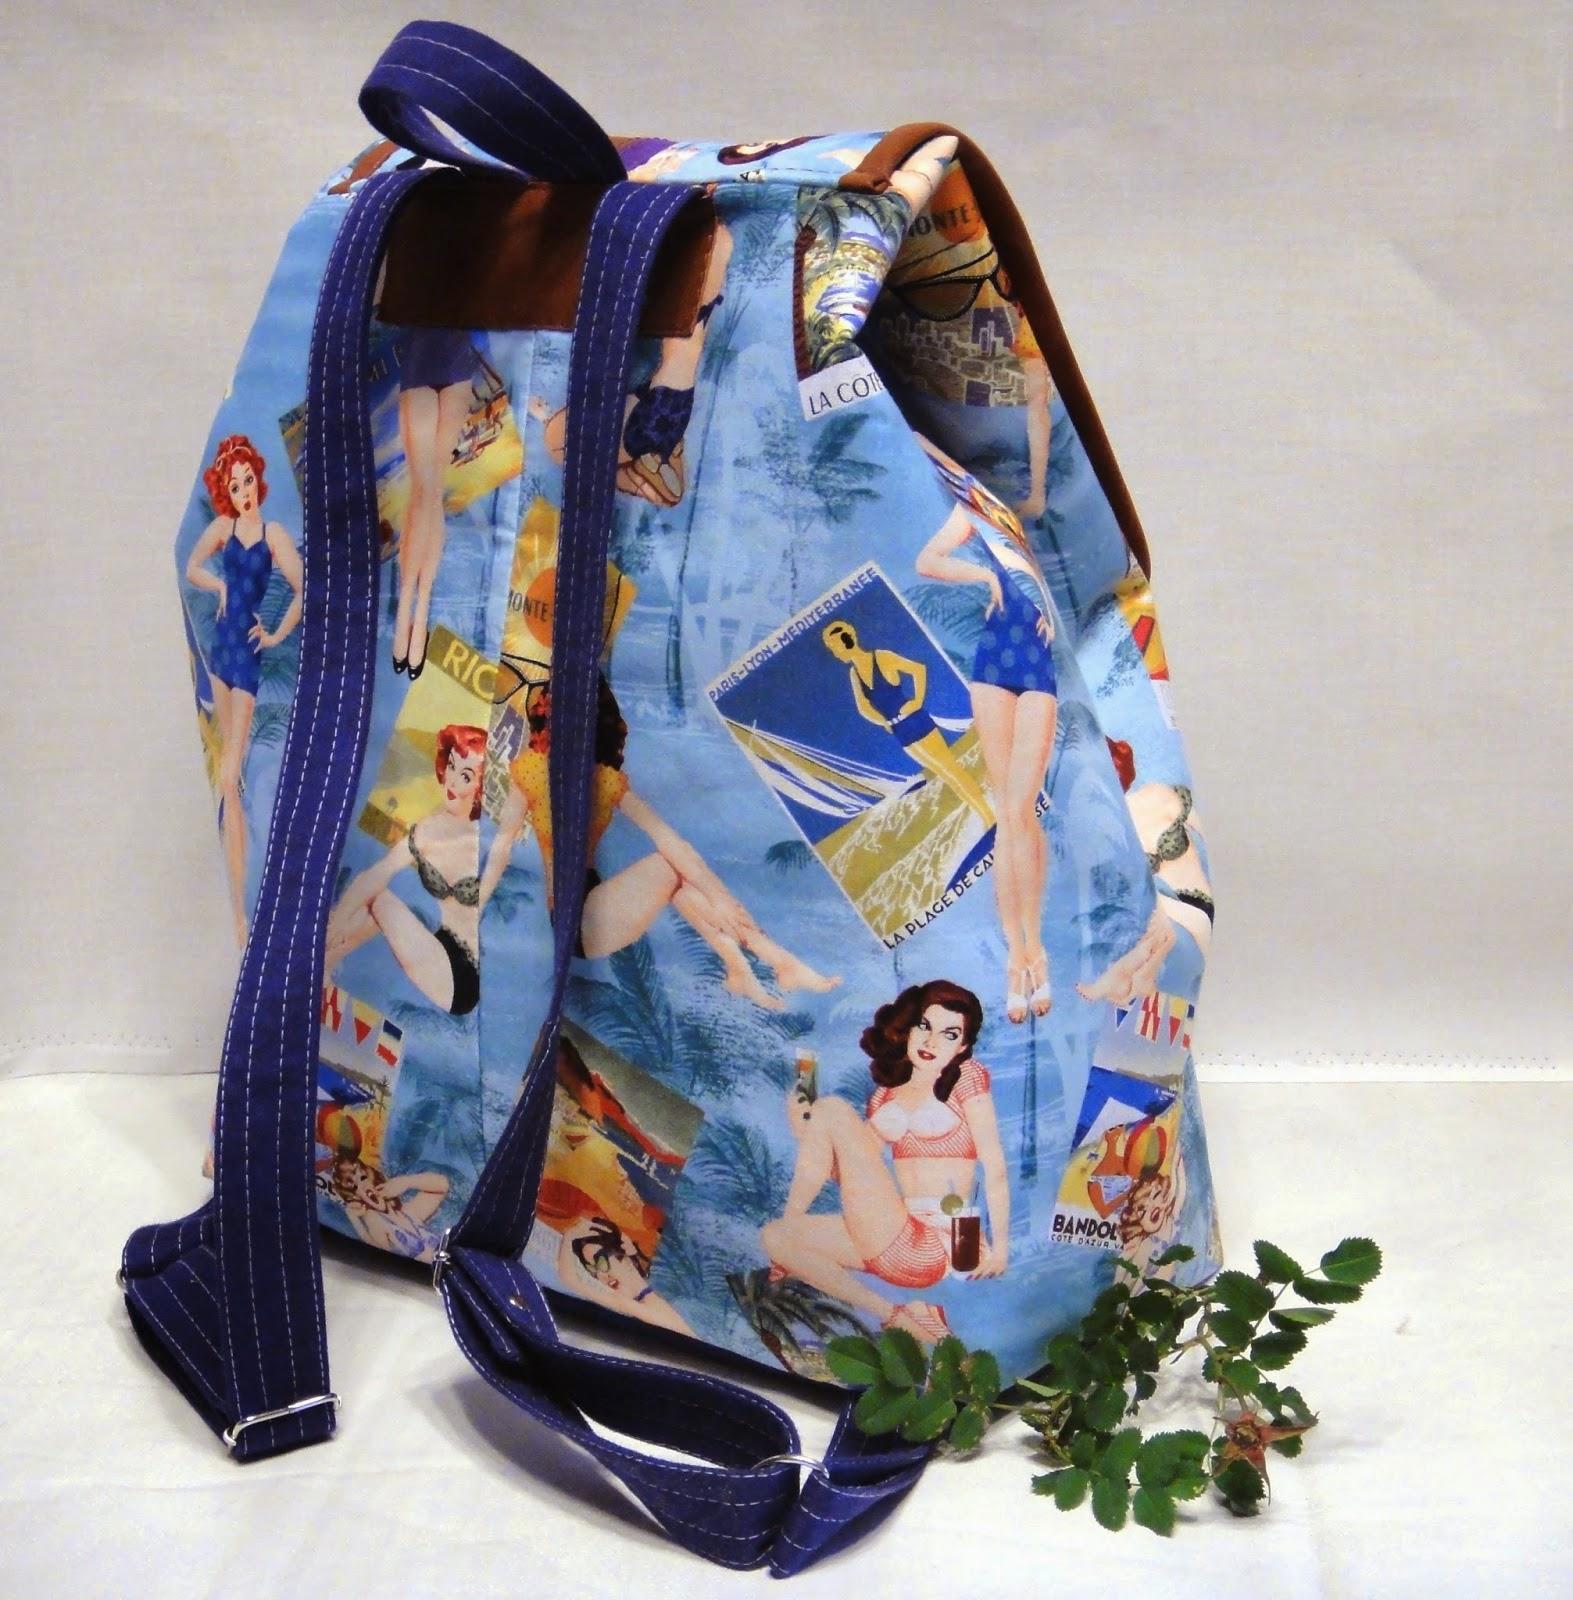 женский рюкзак на лето с длинными бретелями